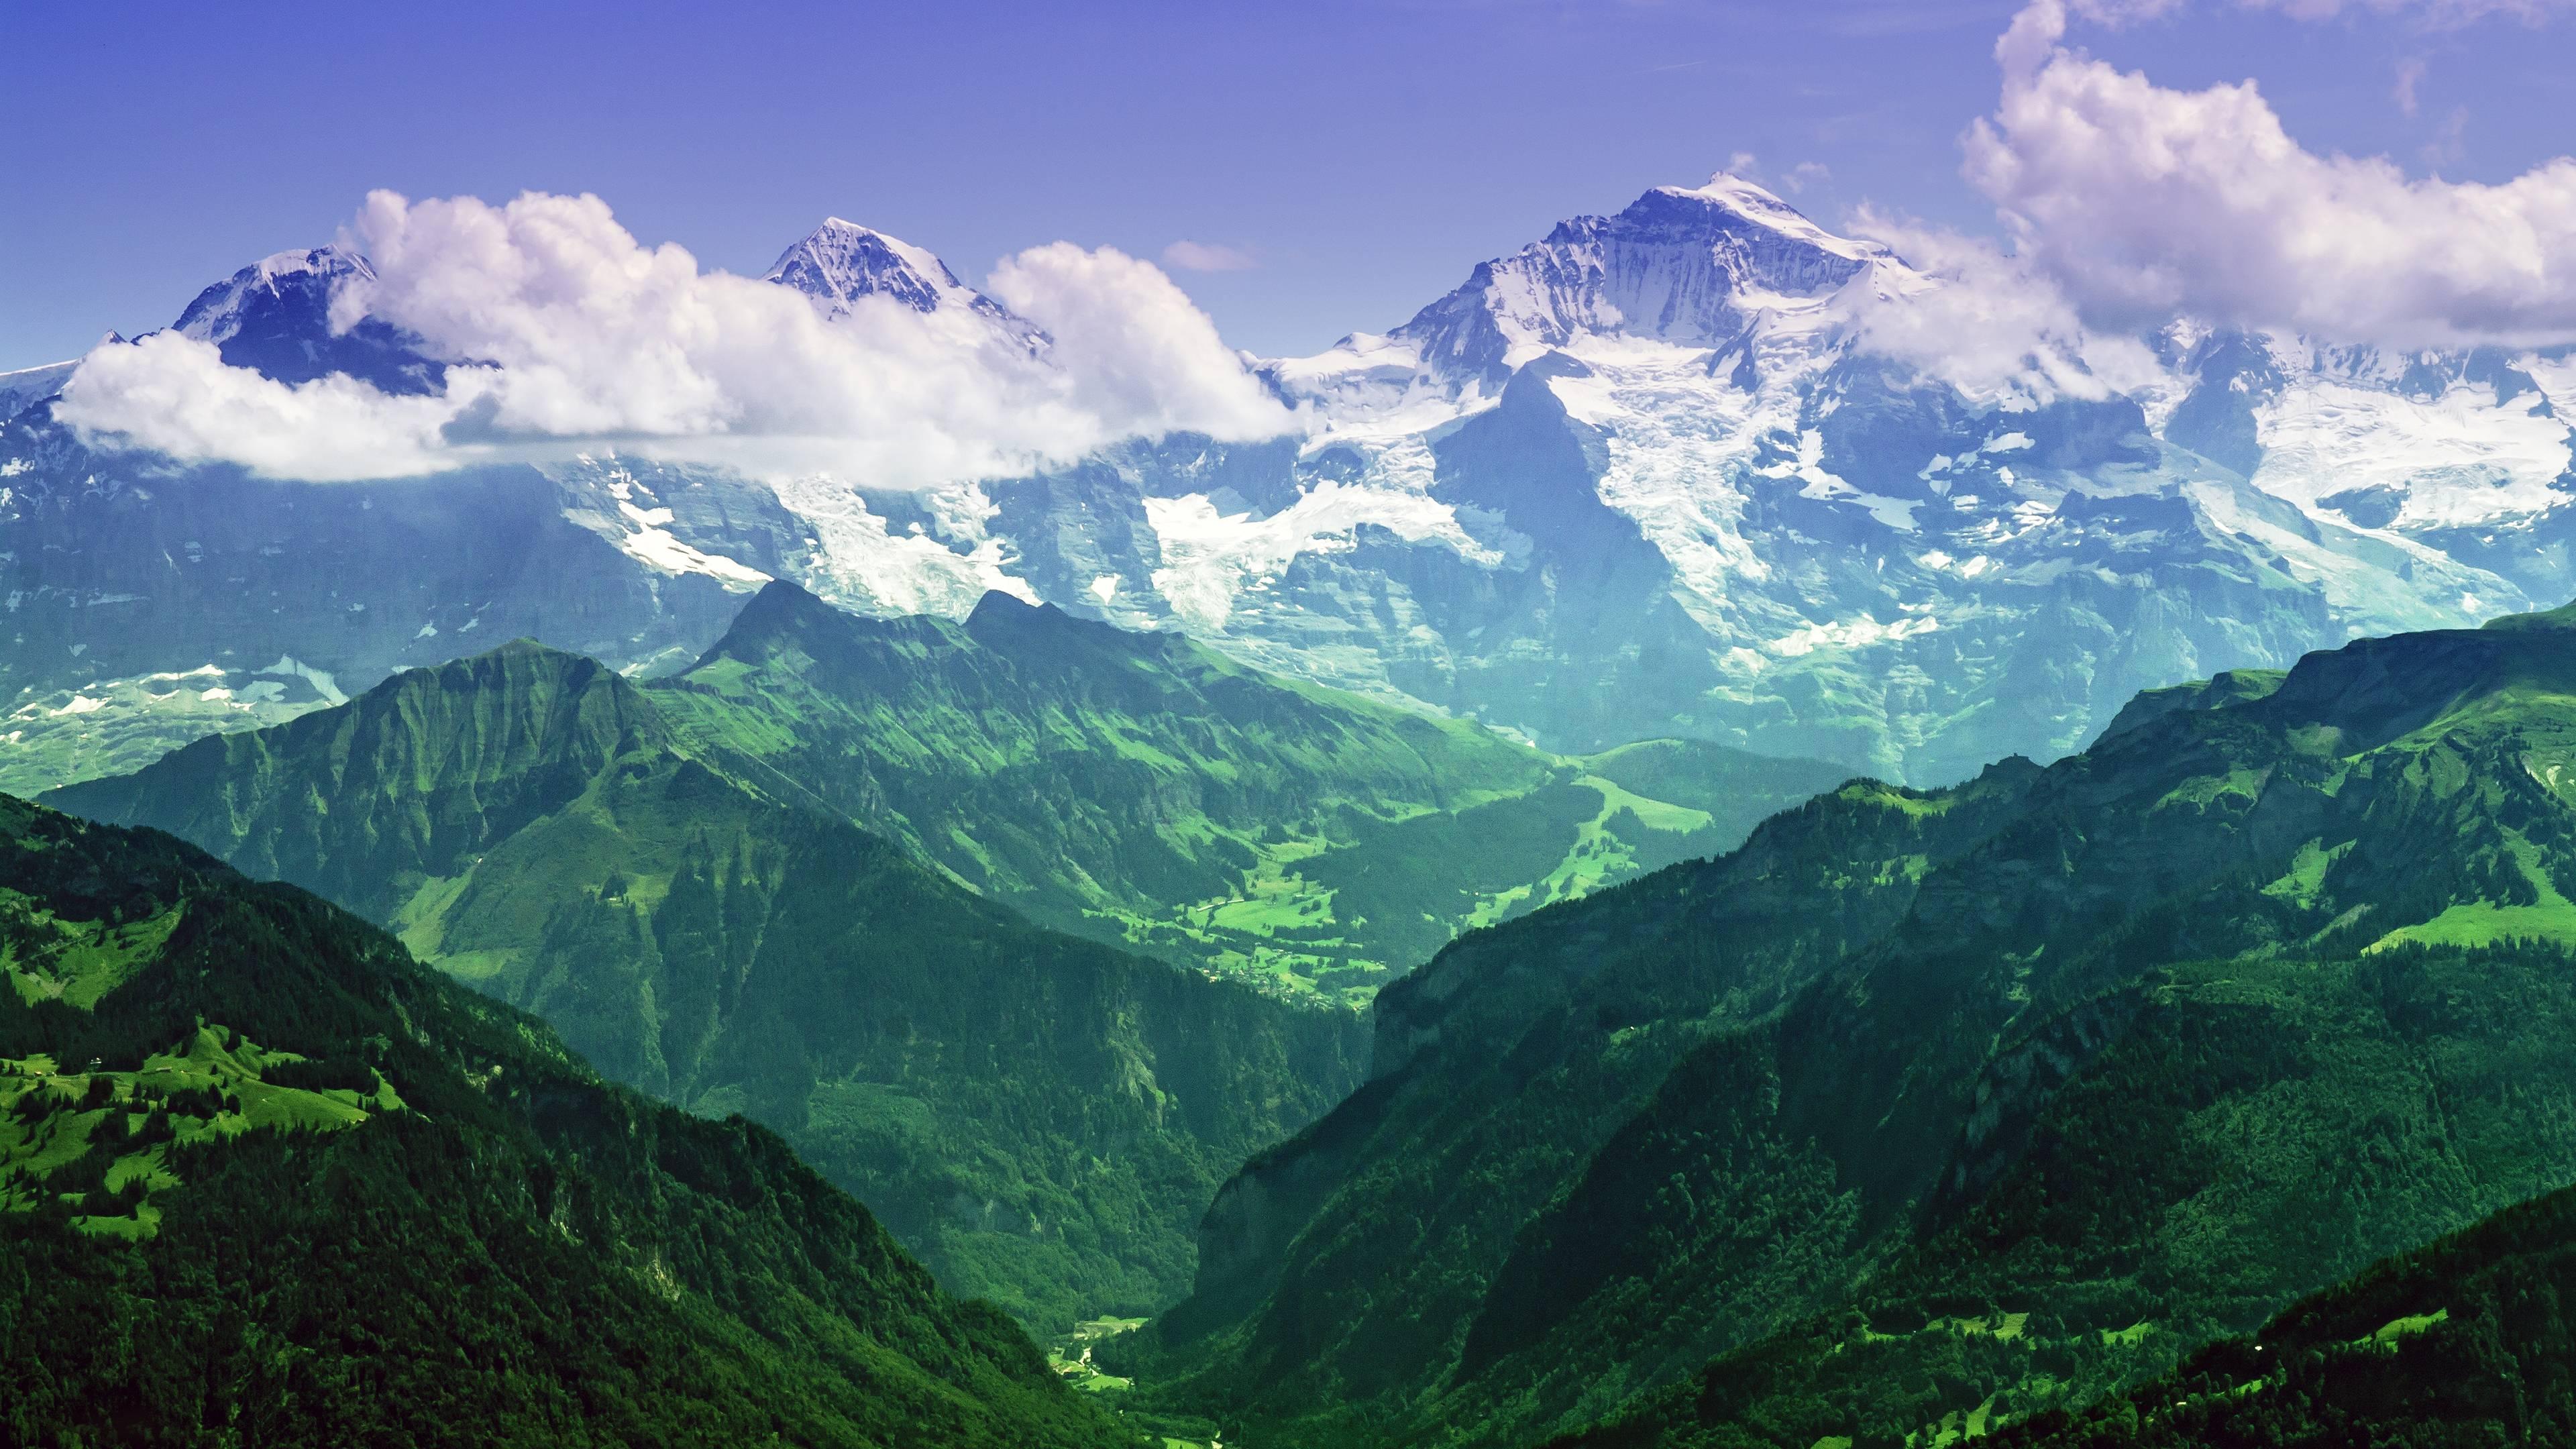 The Mighty Jungfrau Bernese Alps Switzerland [3840x2160 3840x2160